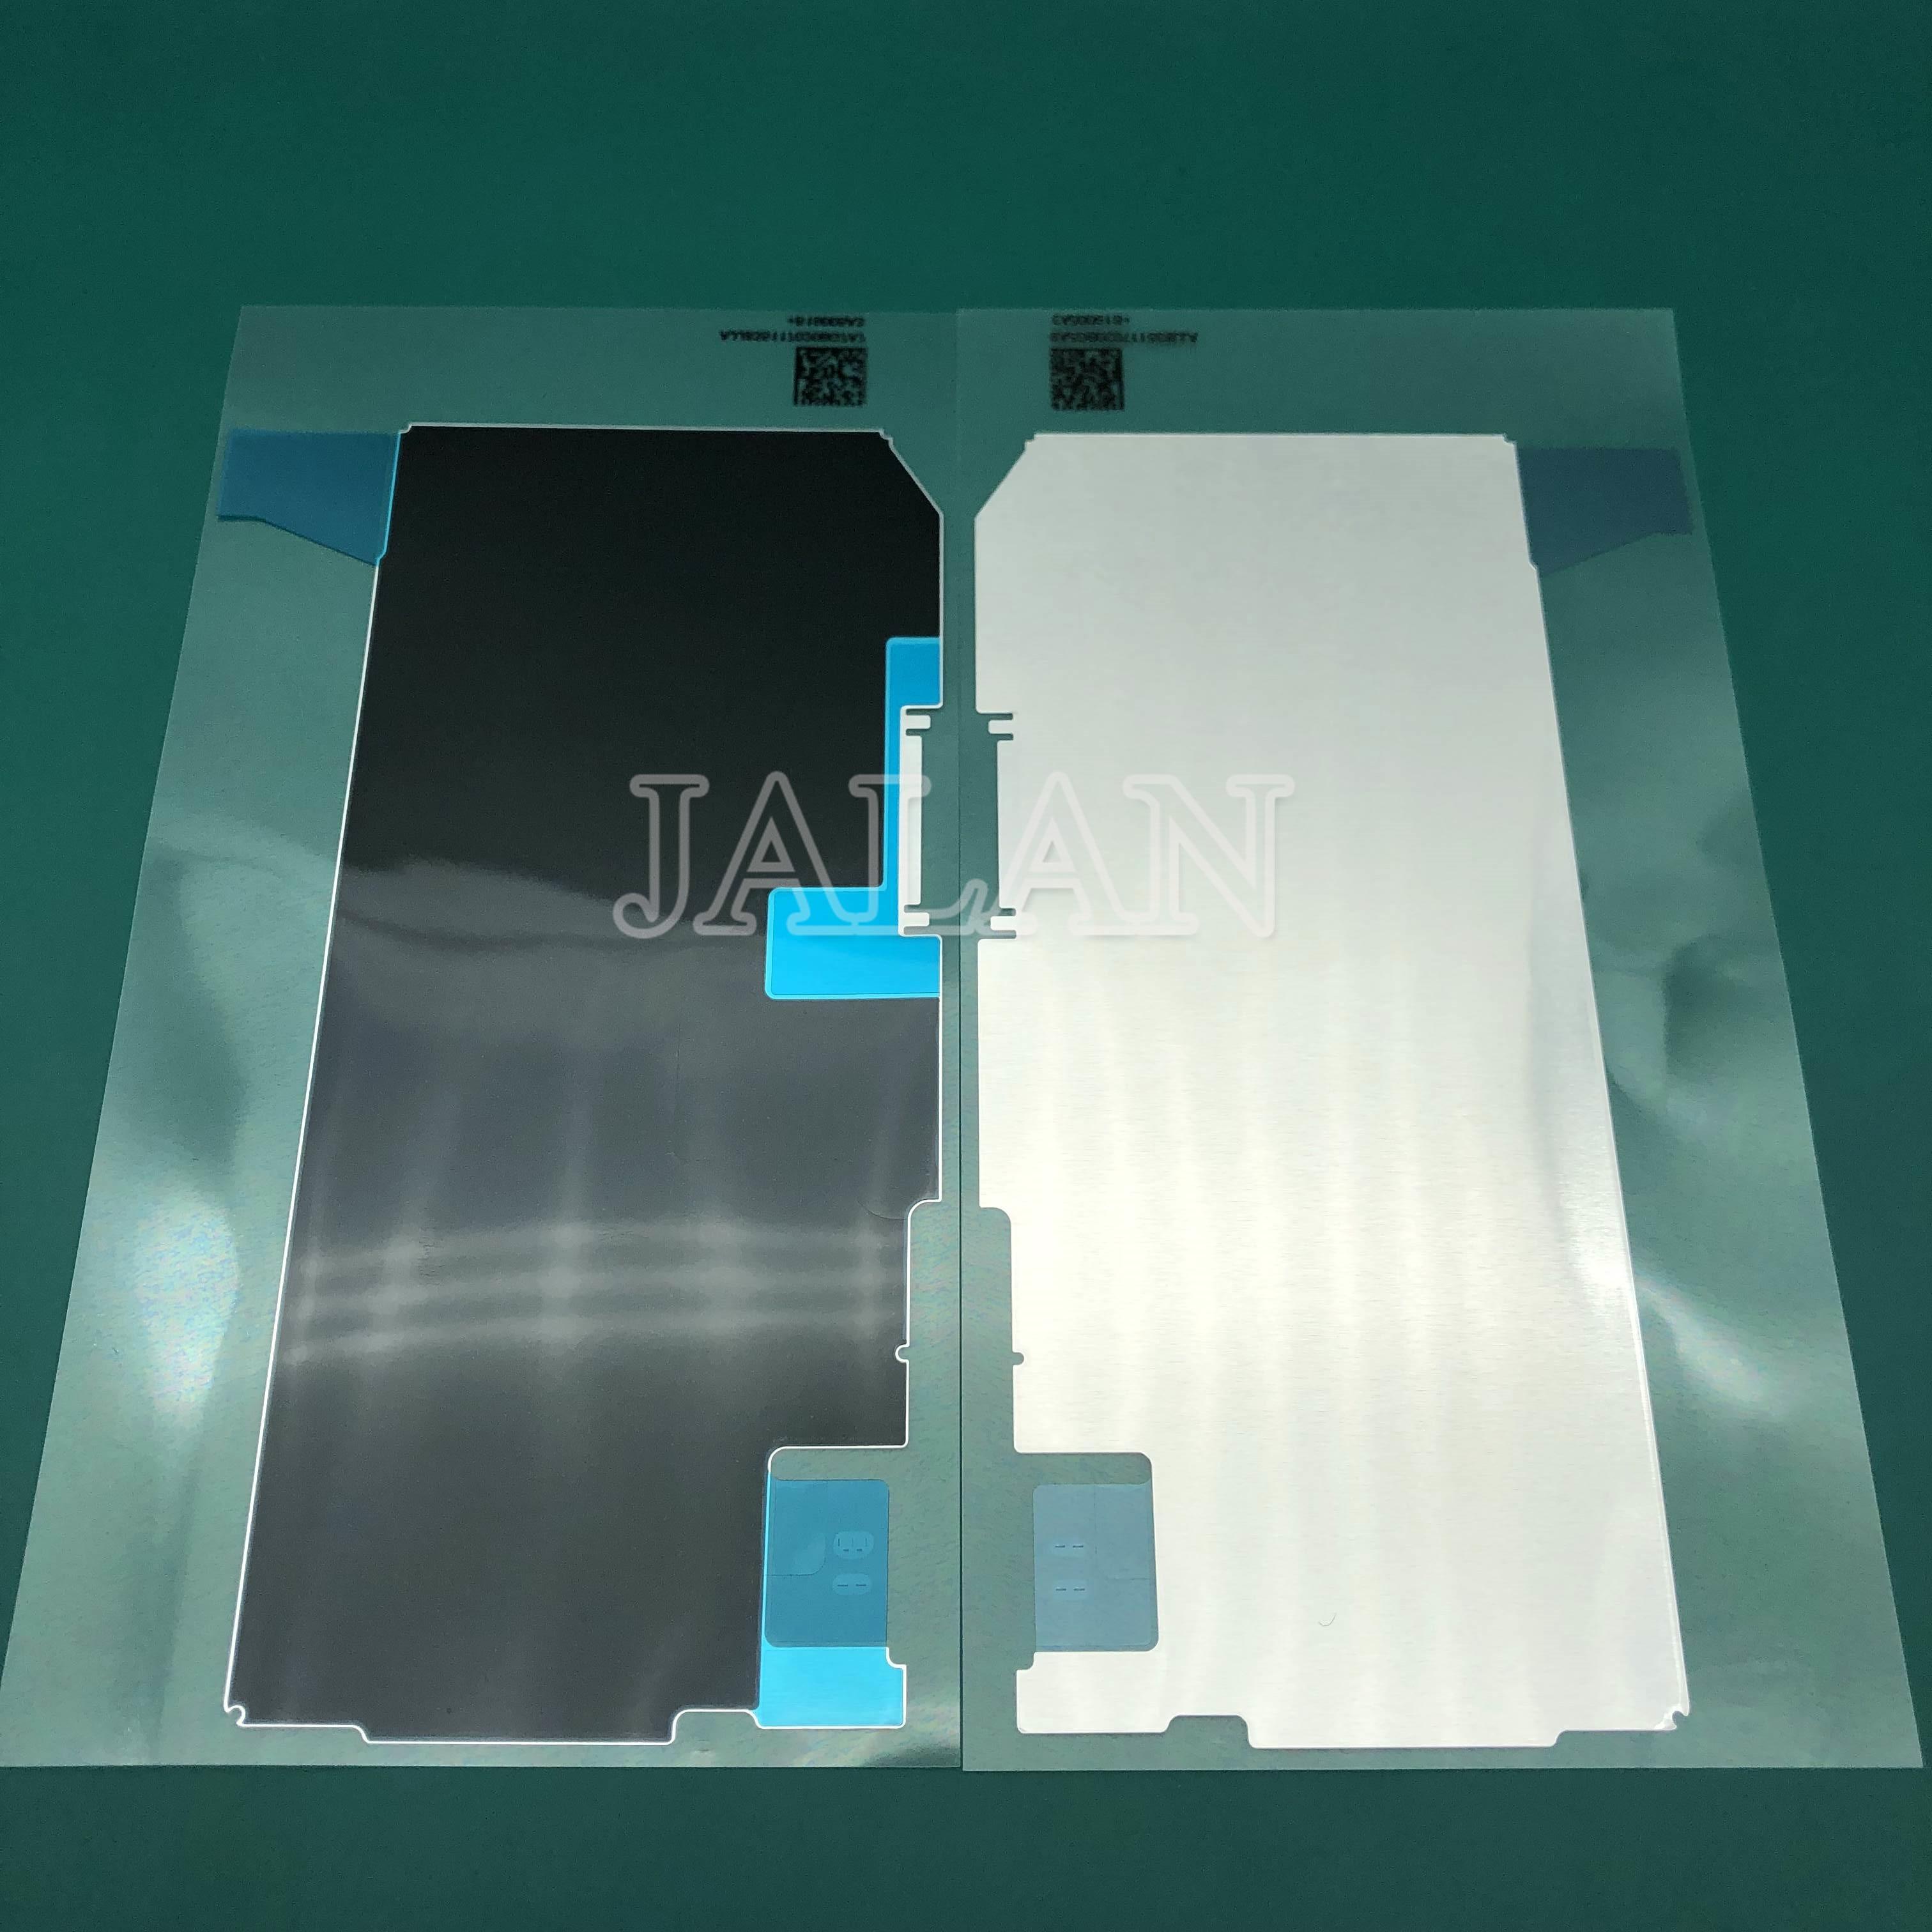 Jalan 10 Buah Hitam Film untuk iPhone X 10 X Max Baterai Isolasi Termal dengan Fungsi Tahan Air untuk iPhone Touch layar